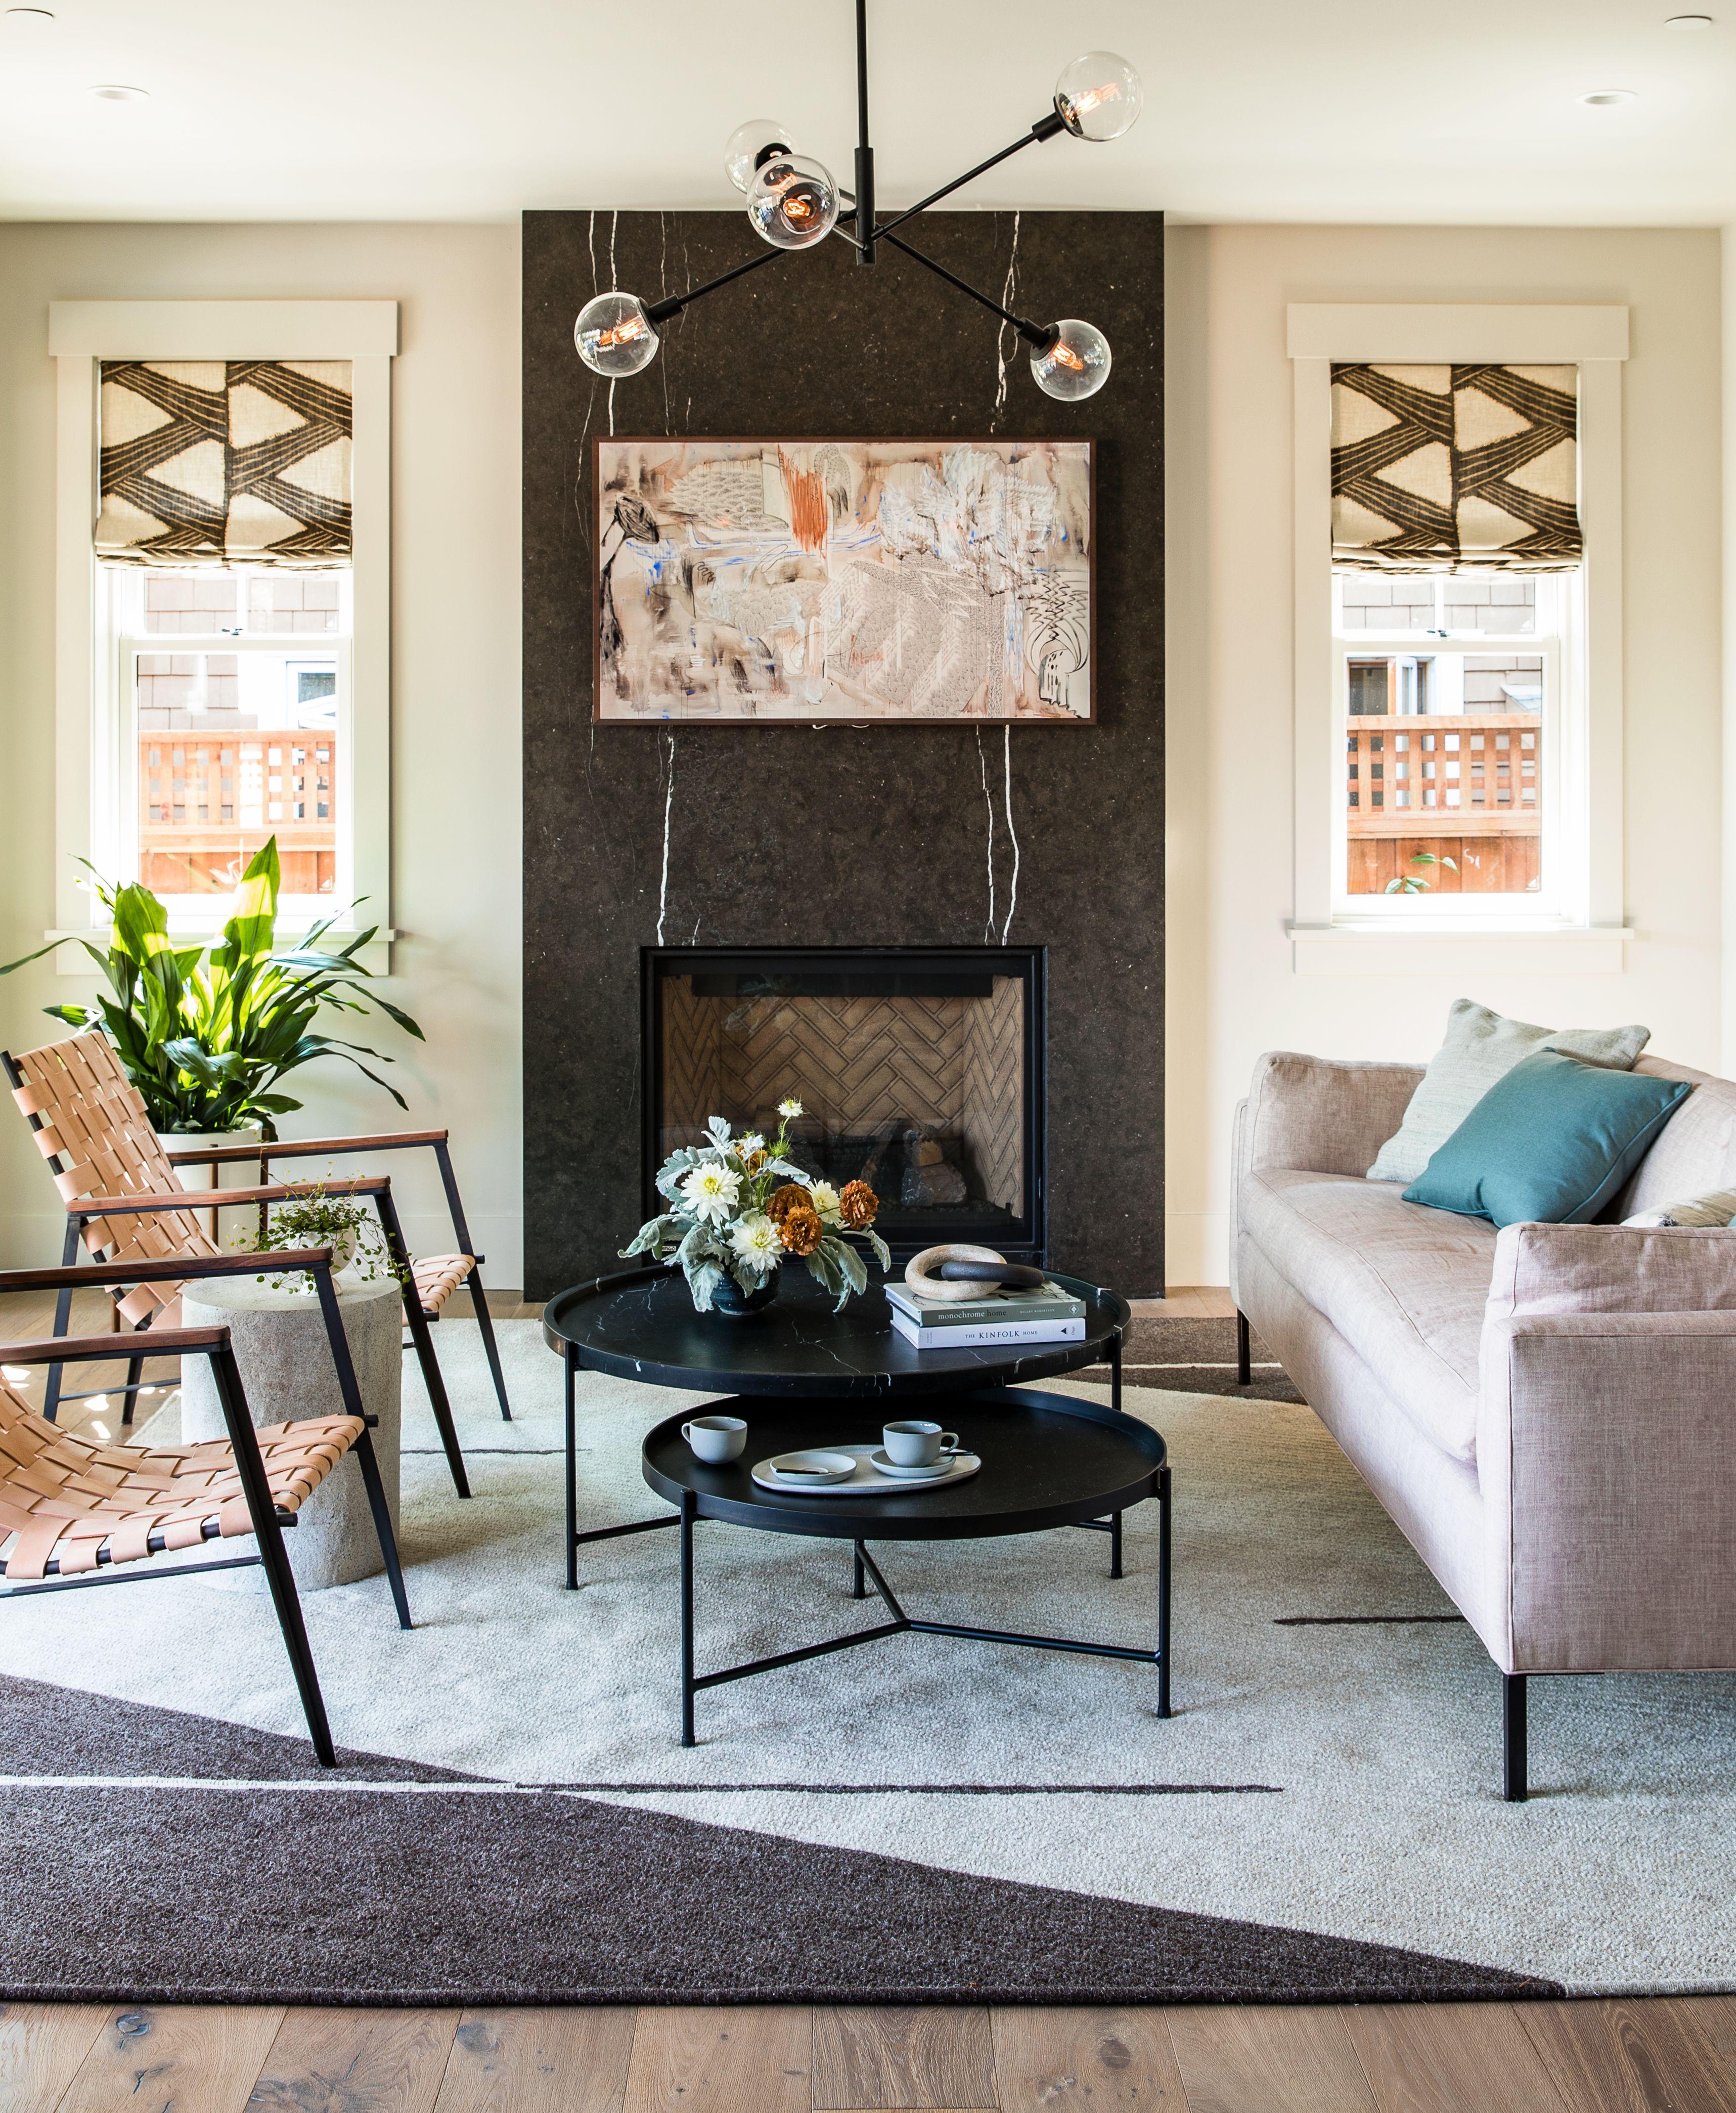 Home Interior Design That S Boldly Innovative Home Interior